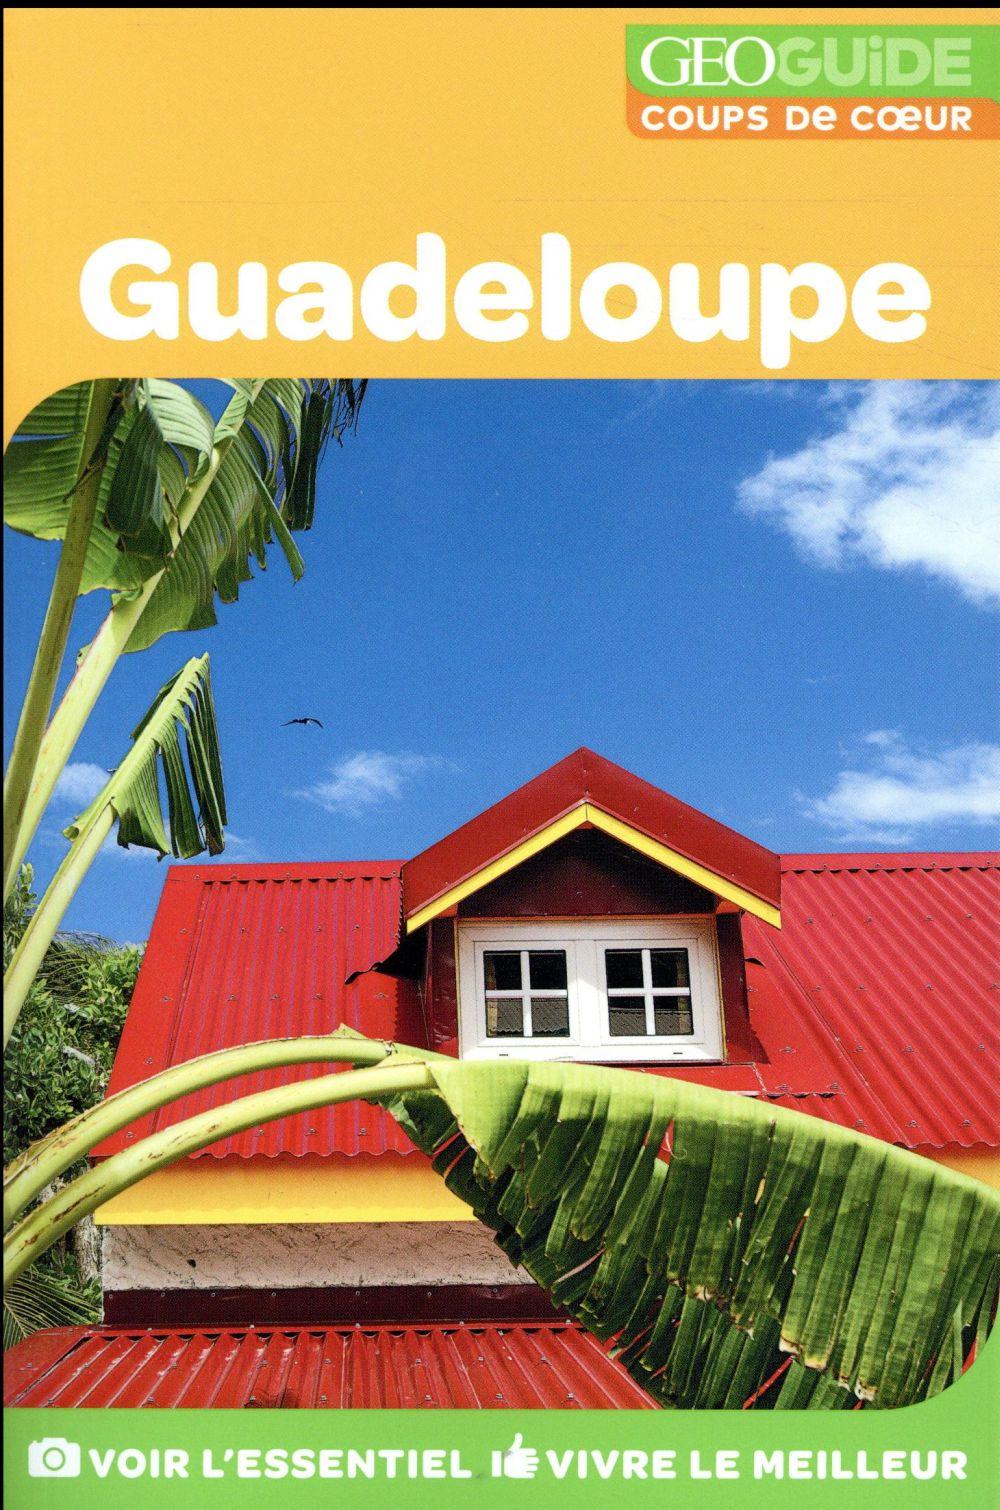 GEOguide coups de coeur ; Guadeloupe